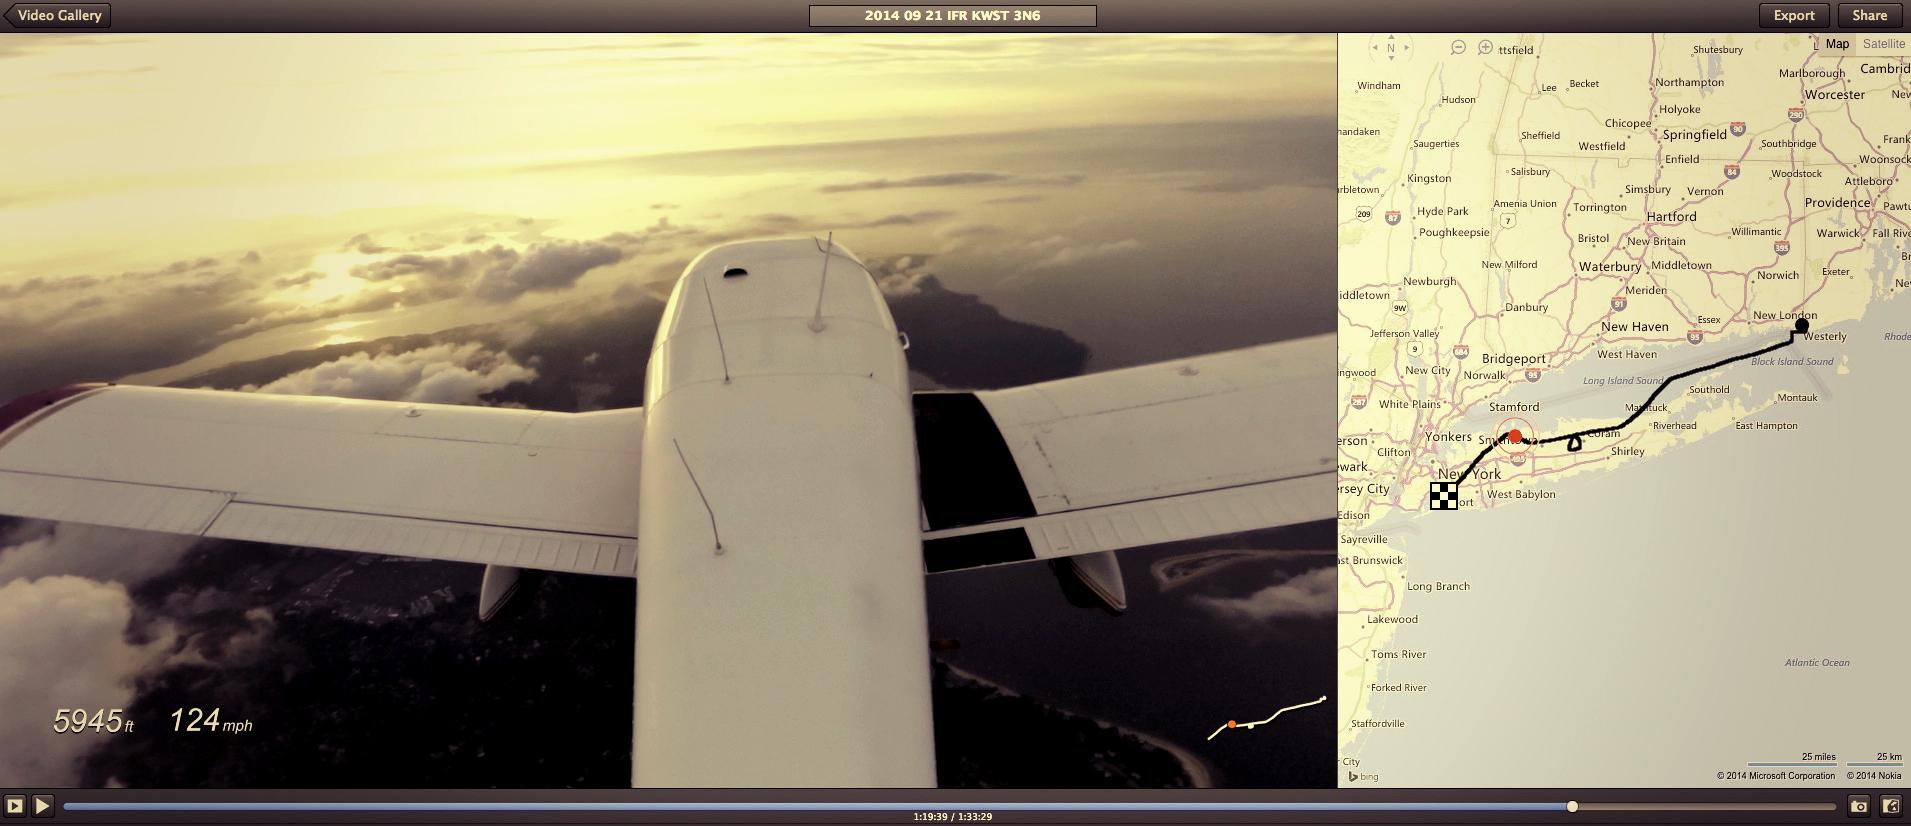 VirbScreenShot.jpg